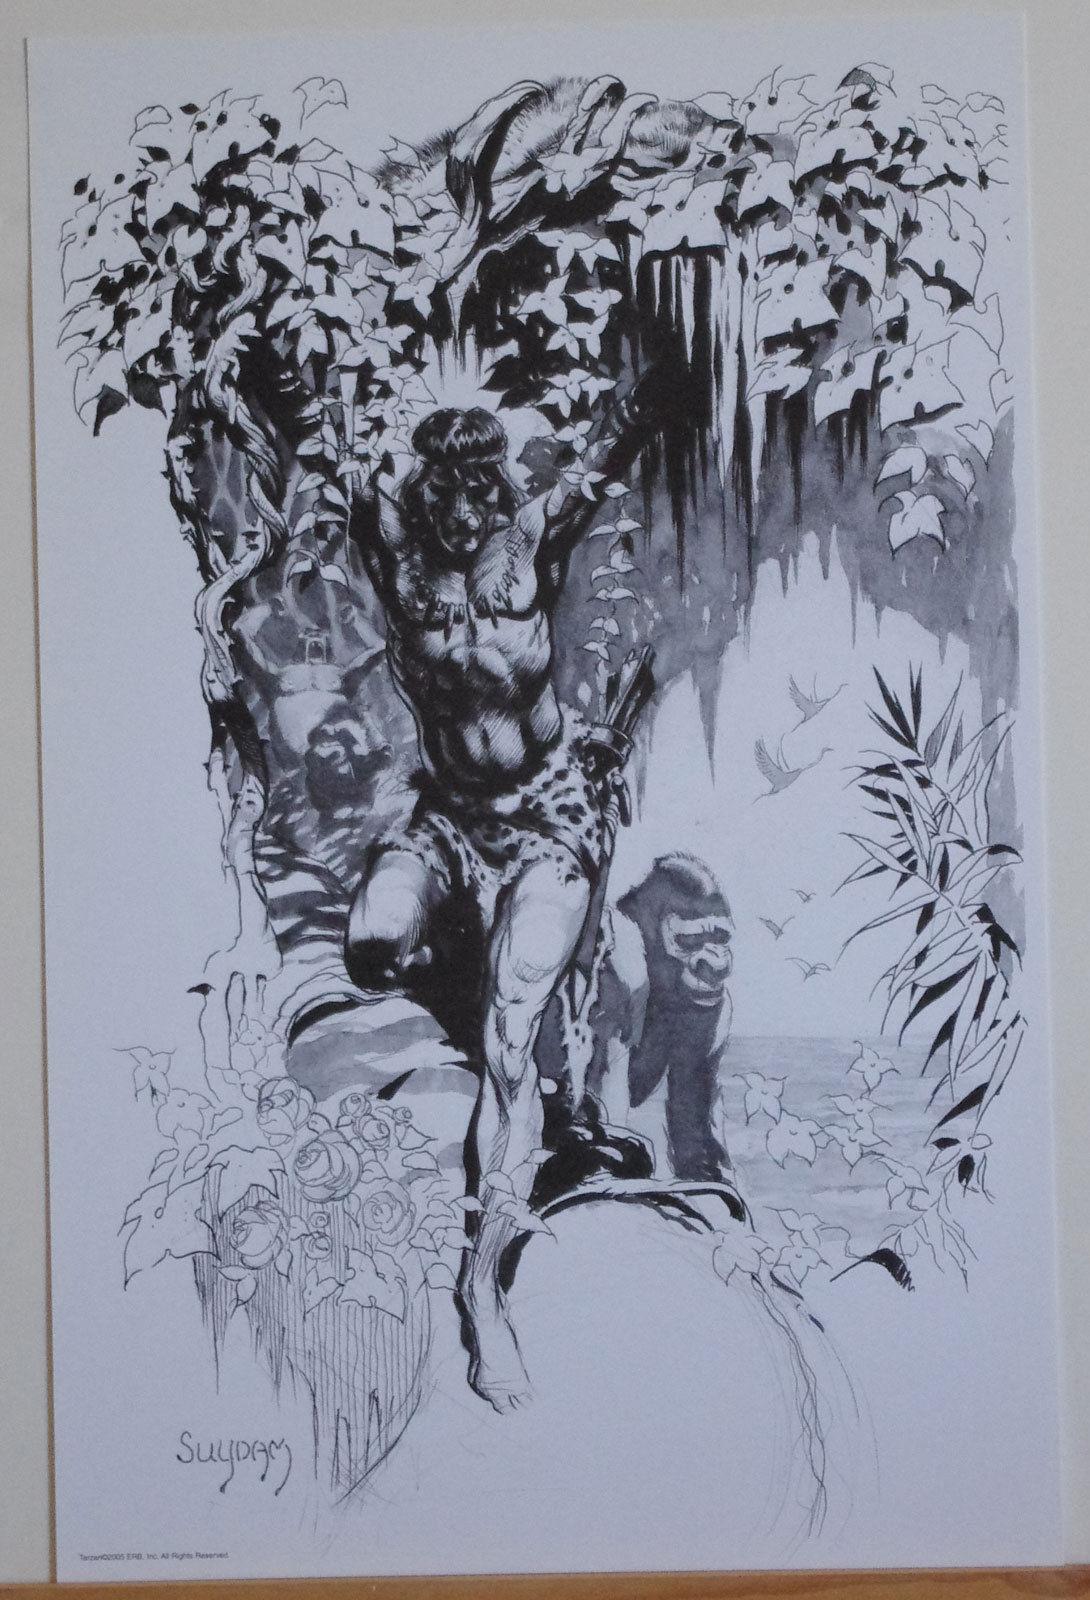 ARTHUR SUYDAM, TARZAN print, ERB, of the Apes, in tree w gorillas, 11